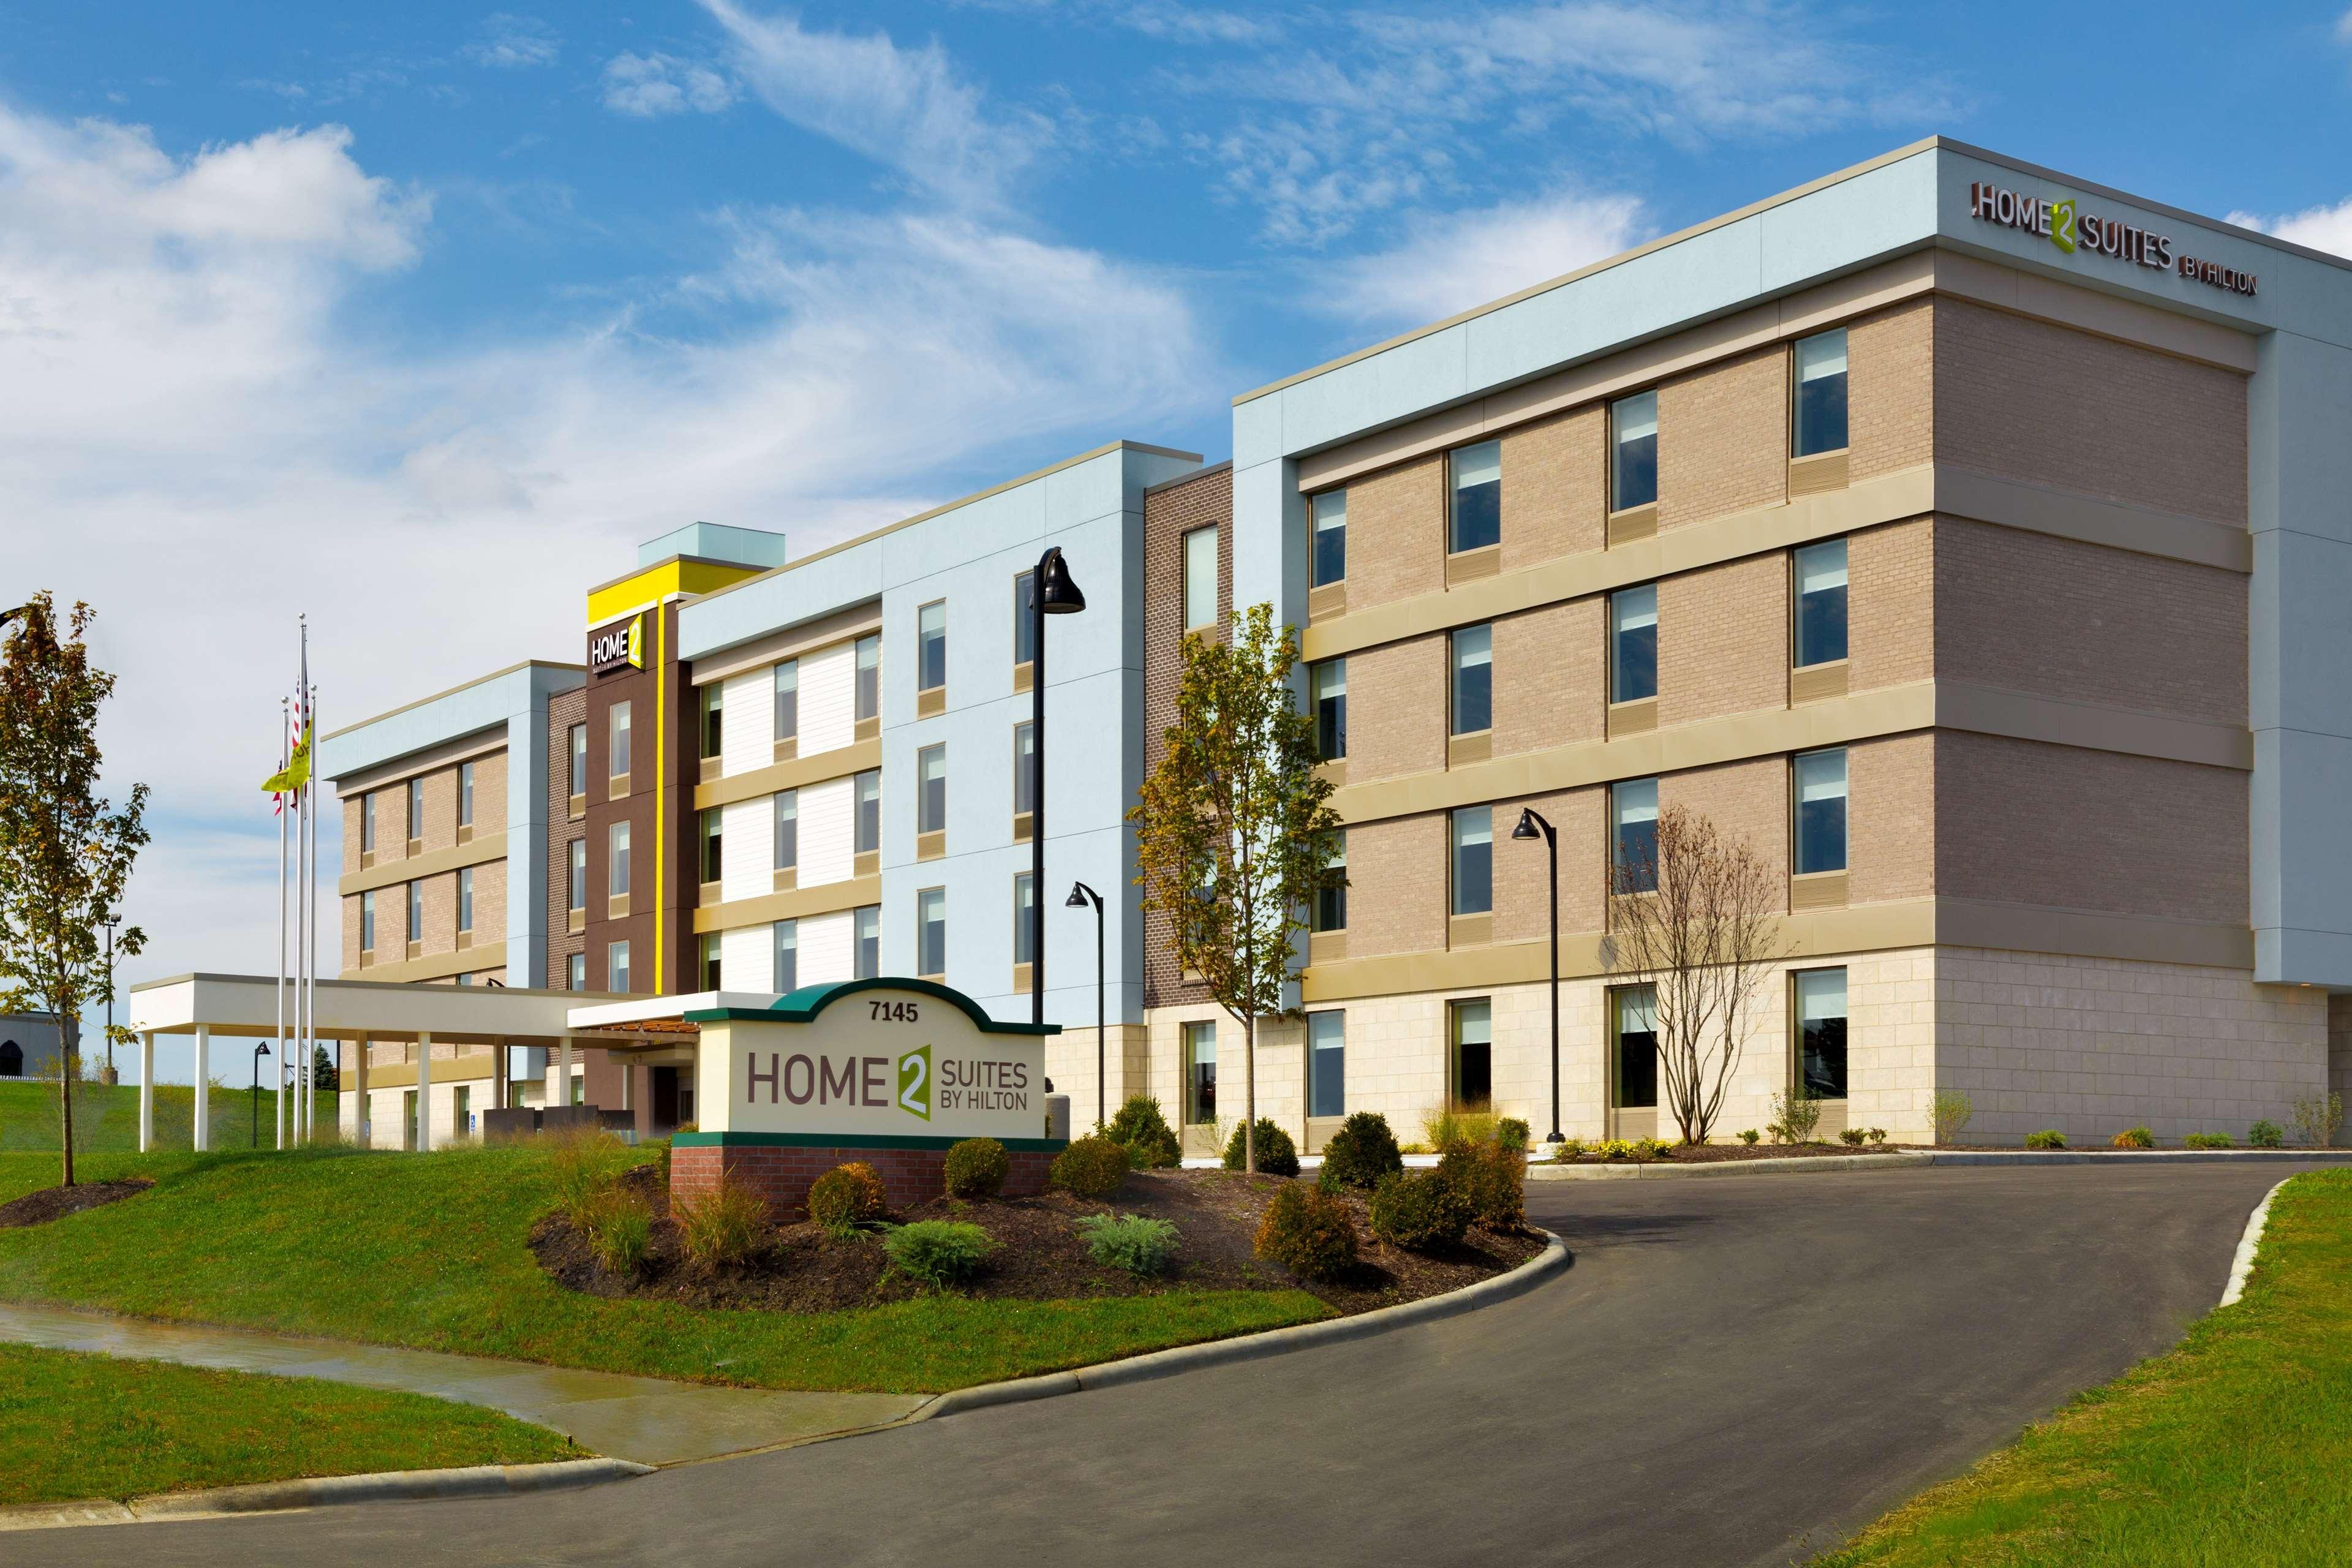 Home2 Suites by Hilton Cincinnati Liberty Township image 0